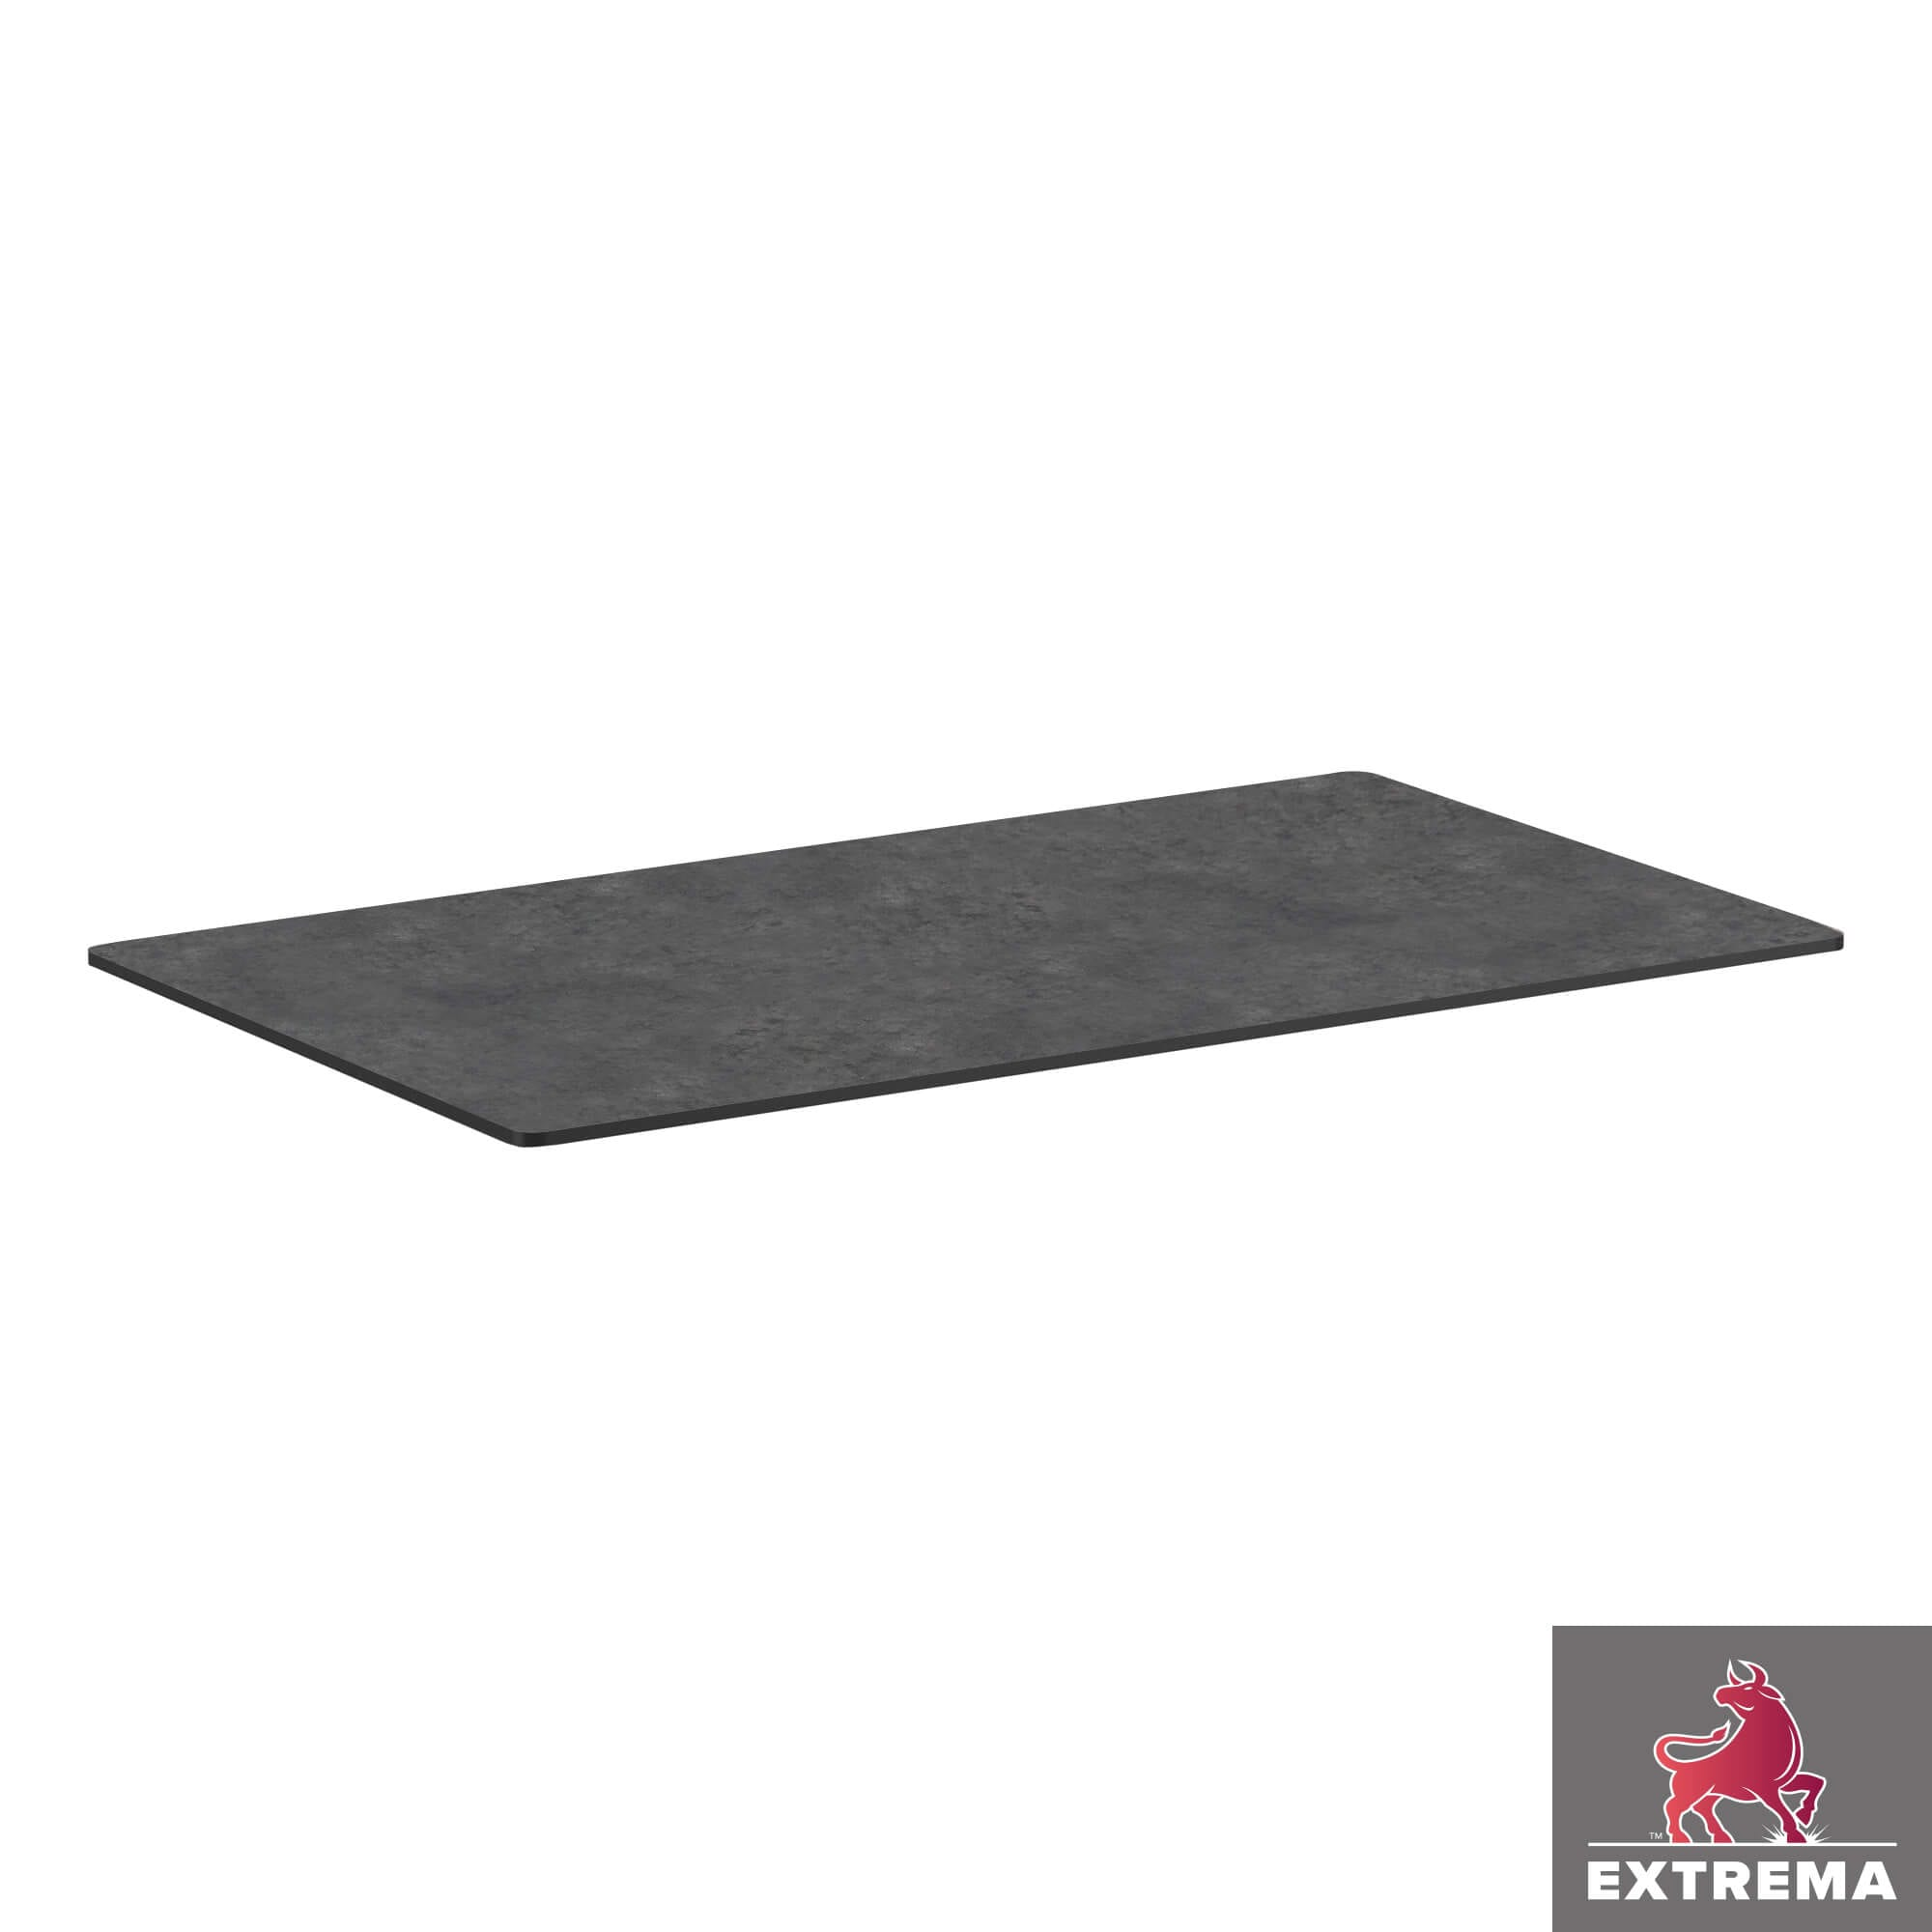 Erman Top - Metalic Anthraite - 119x69cm Rect